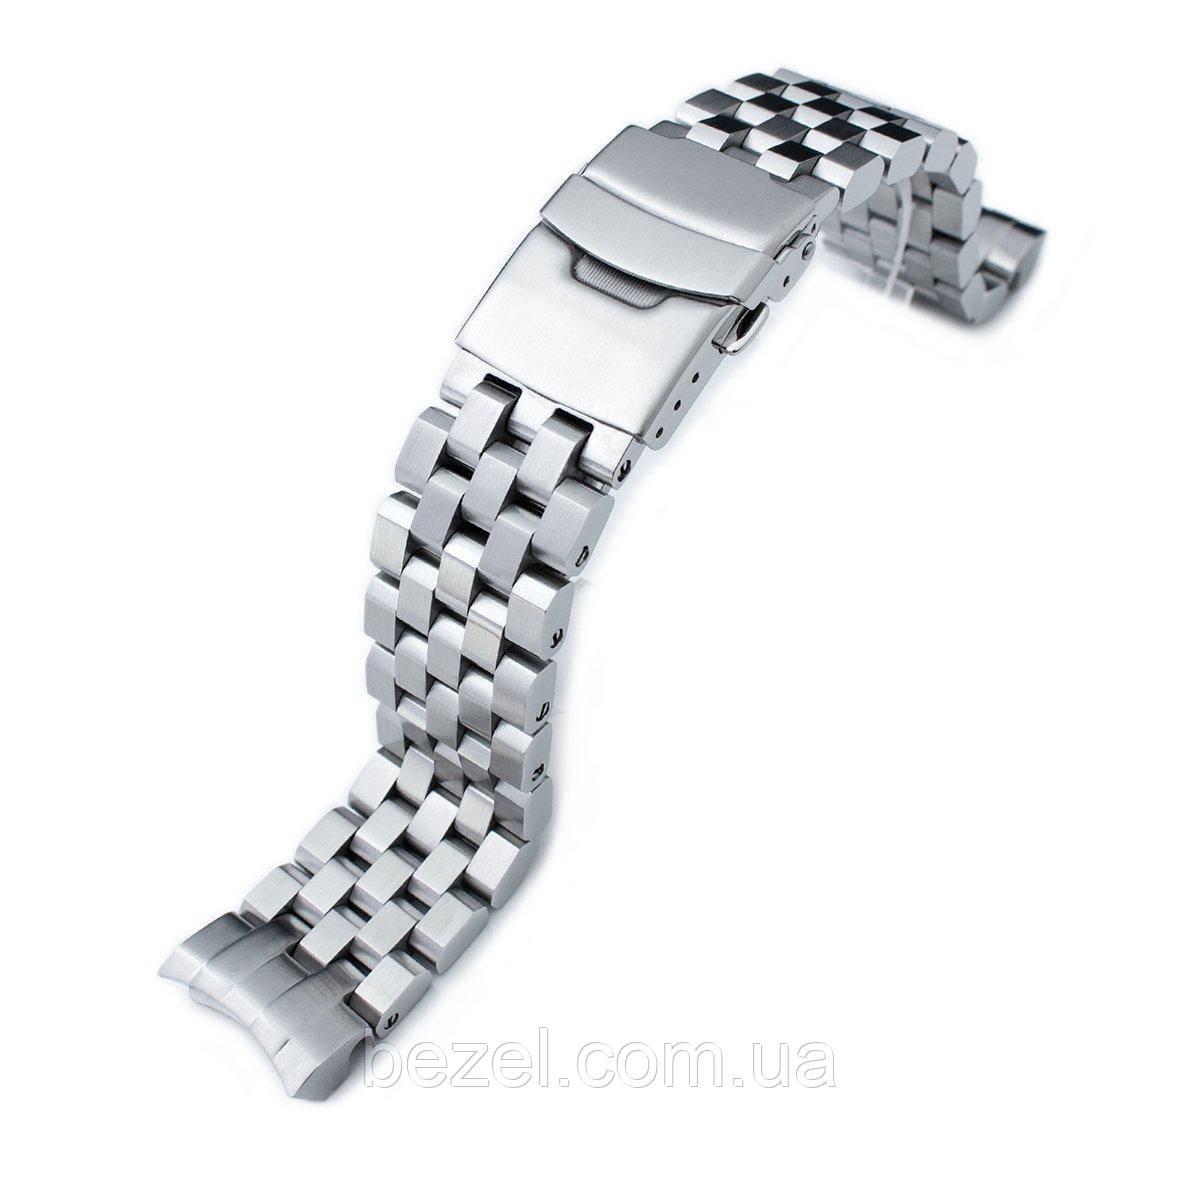 20mm Super Engineer II watch band for SEIKO Sumo SBDC001, SBDC003, SBDC005, SBDC031, SBDC033